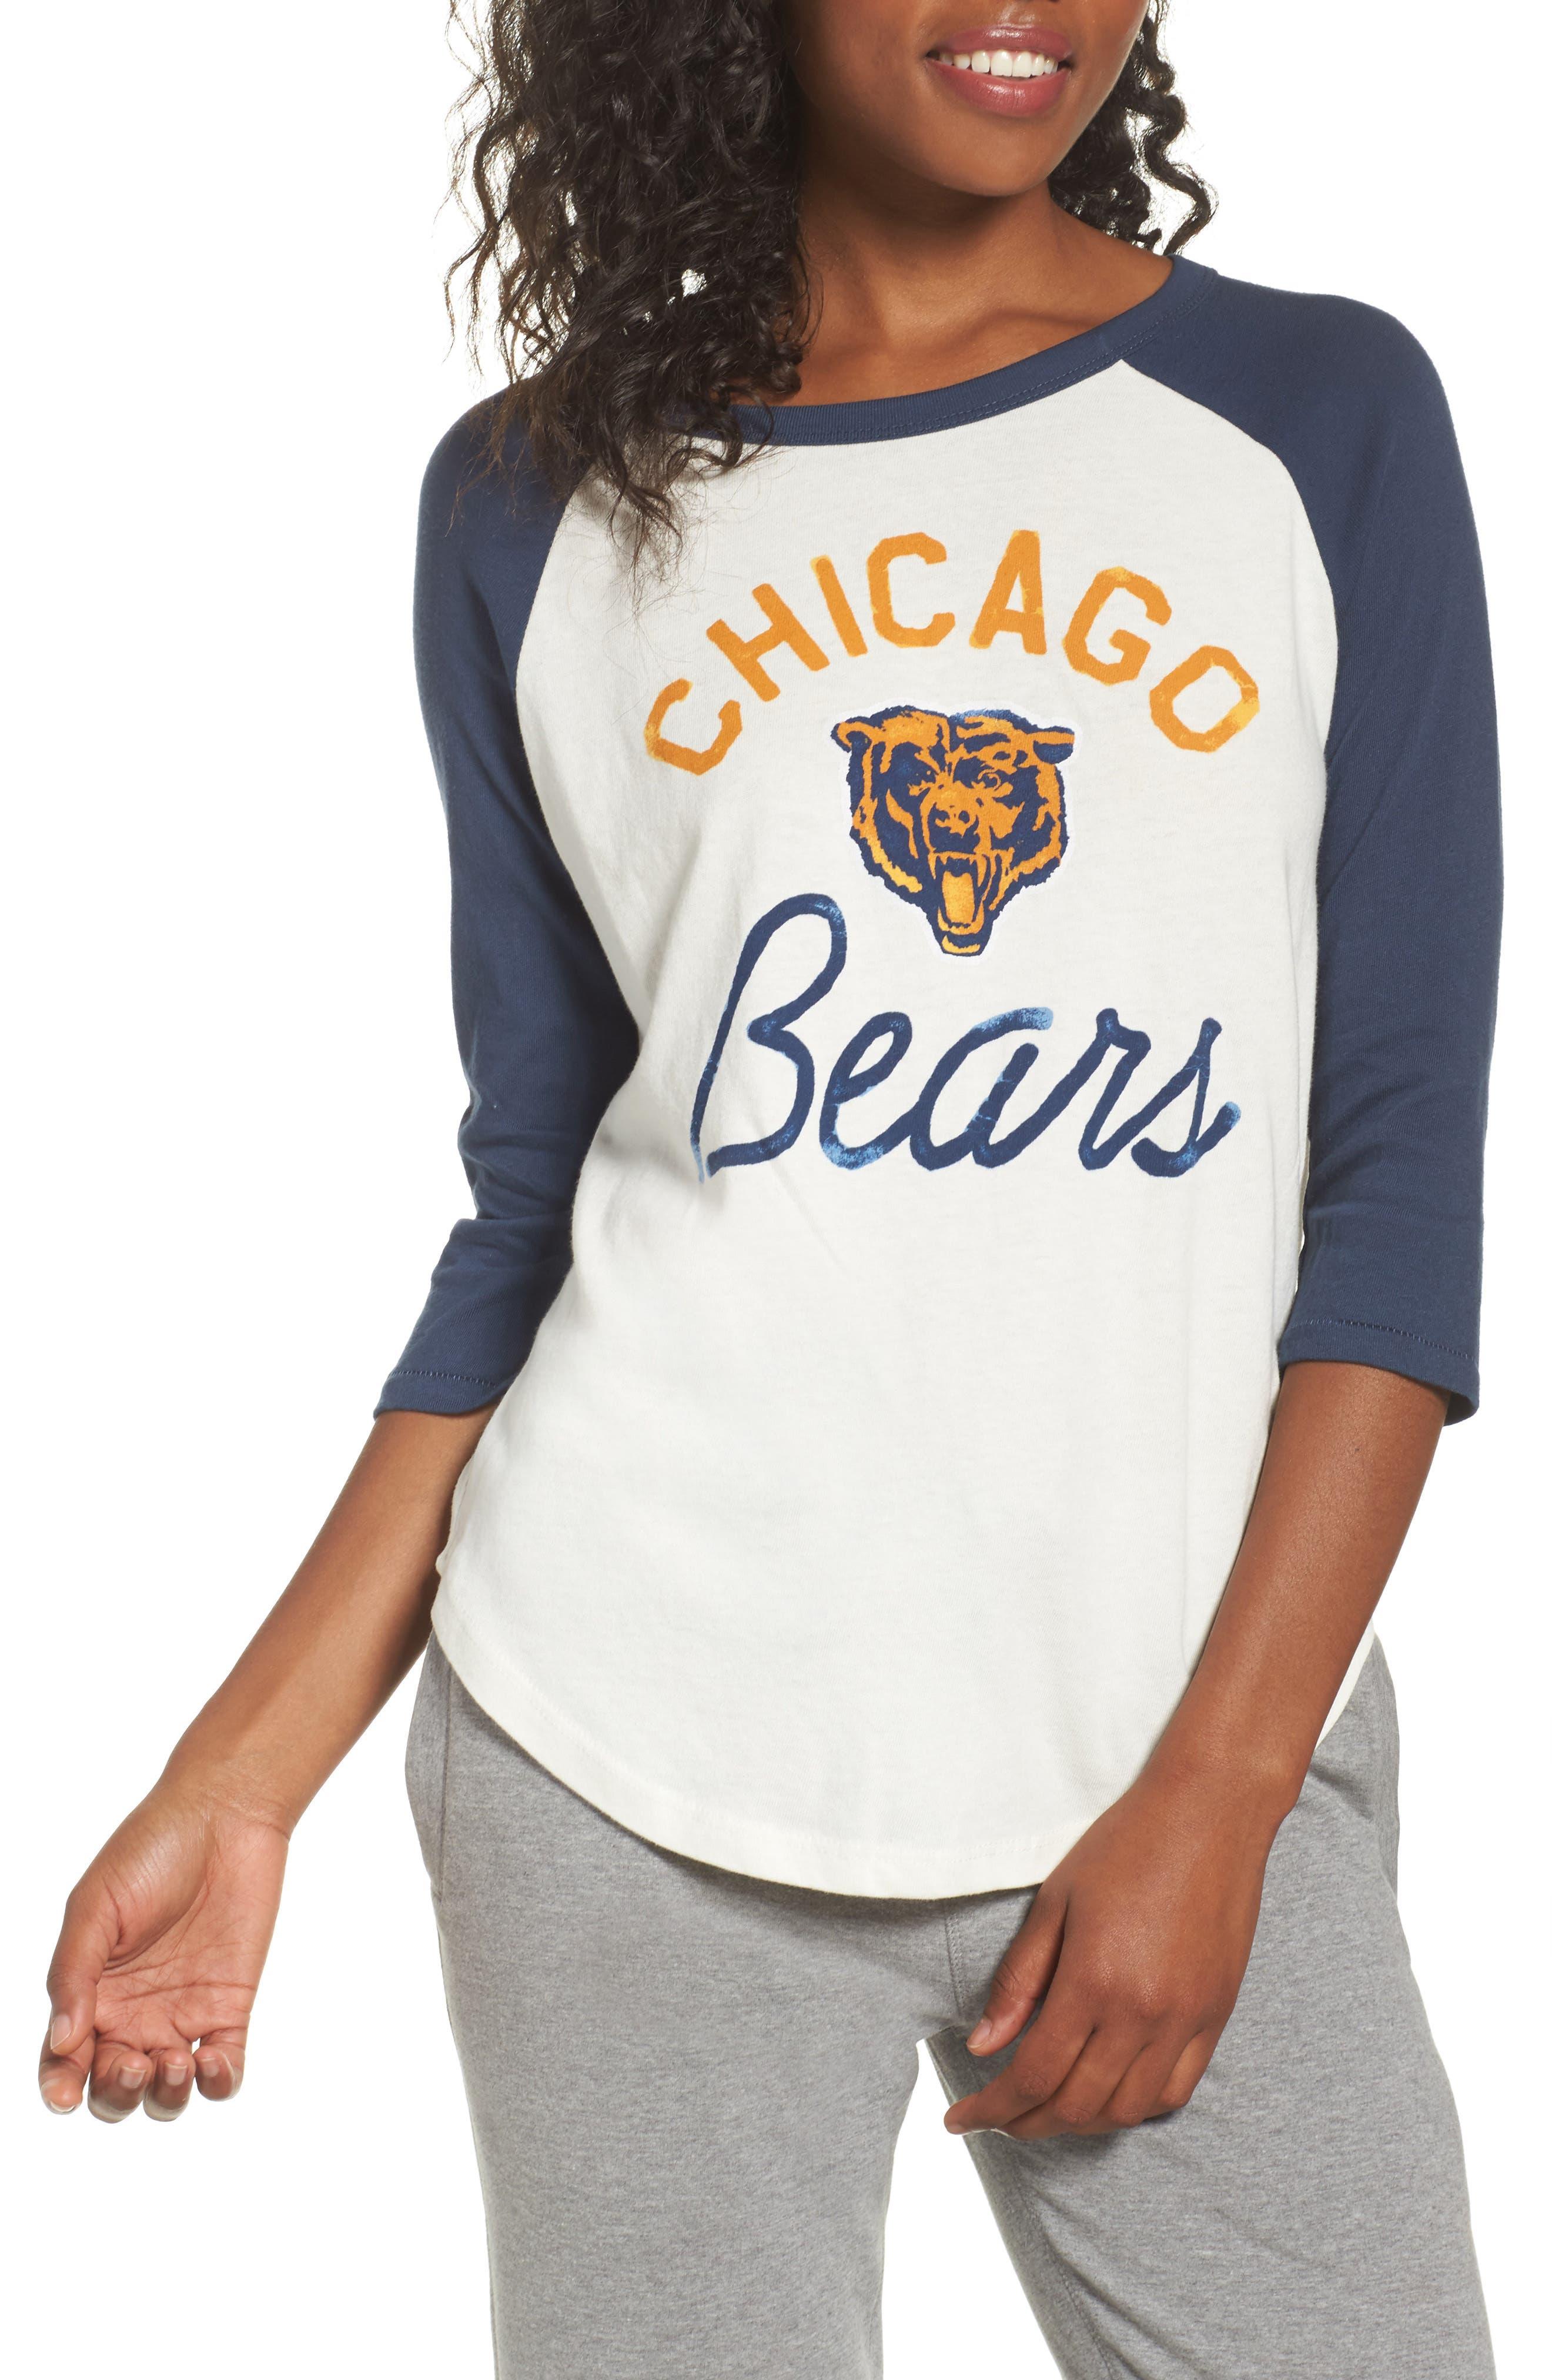 Main Image - Junk Food NFL Chicago Bears Raglan Tee